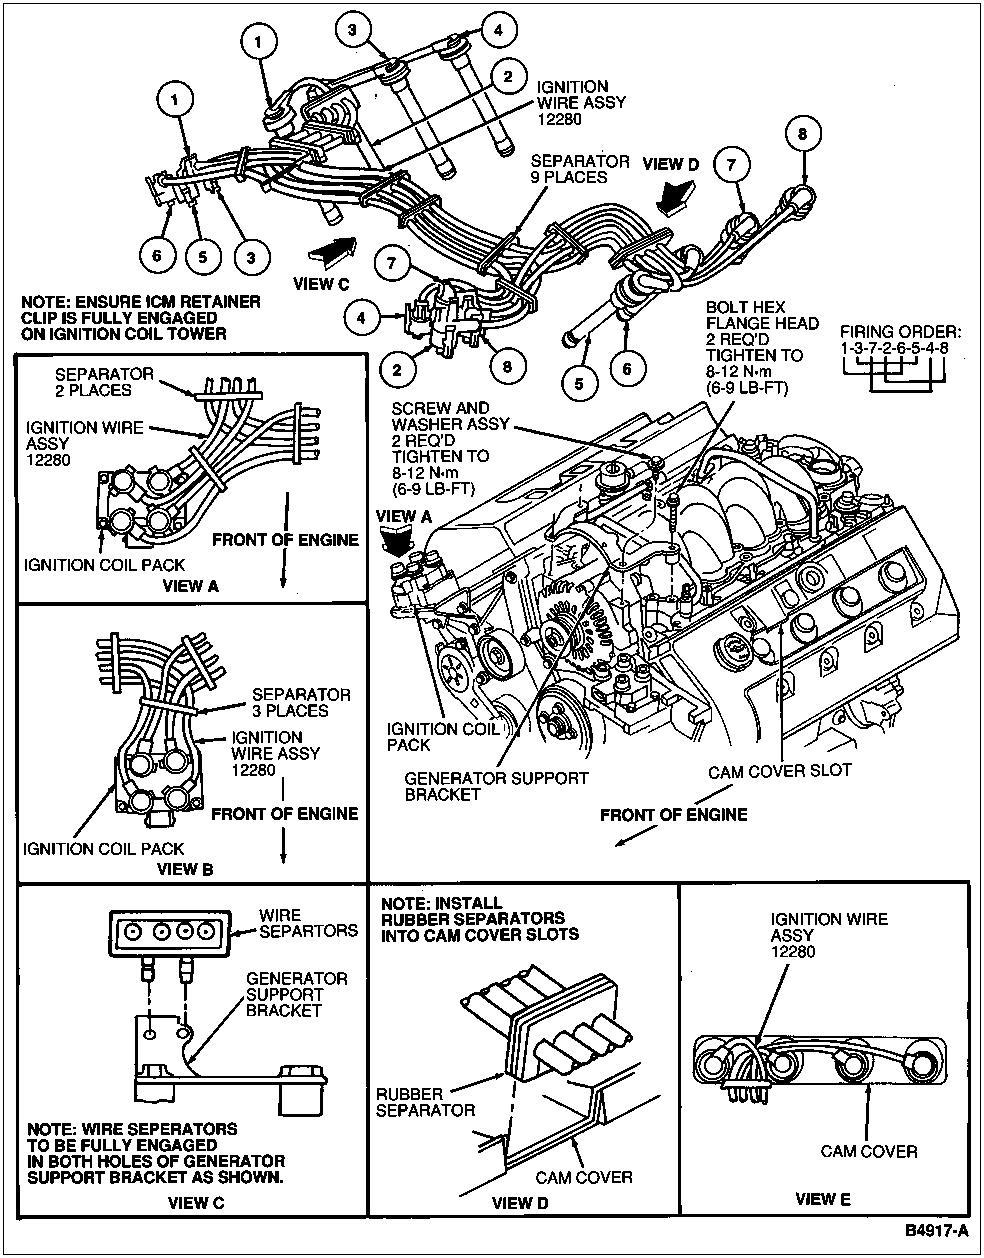 Diagram] Chevrolet Spark Wiring Diagram Full Version Hd